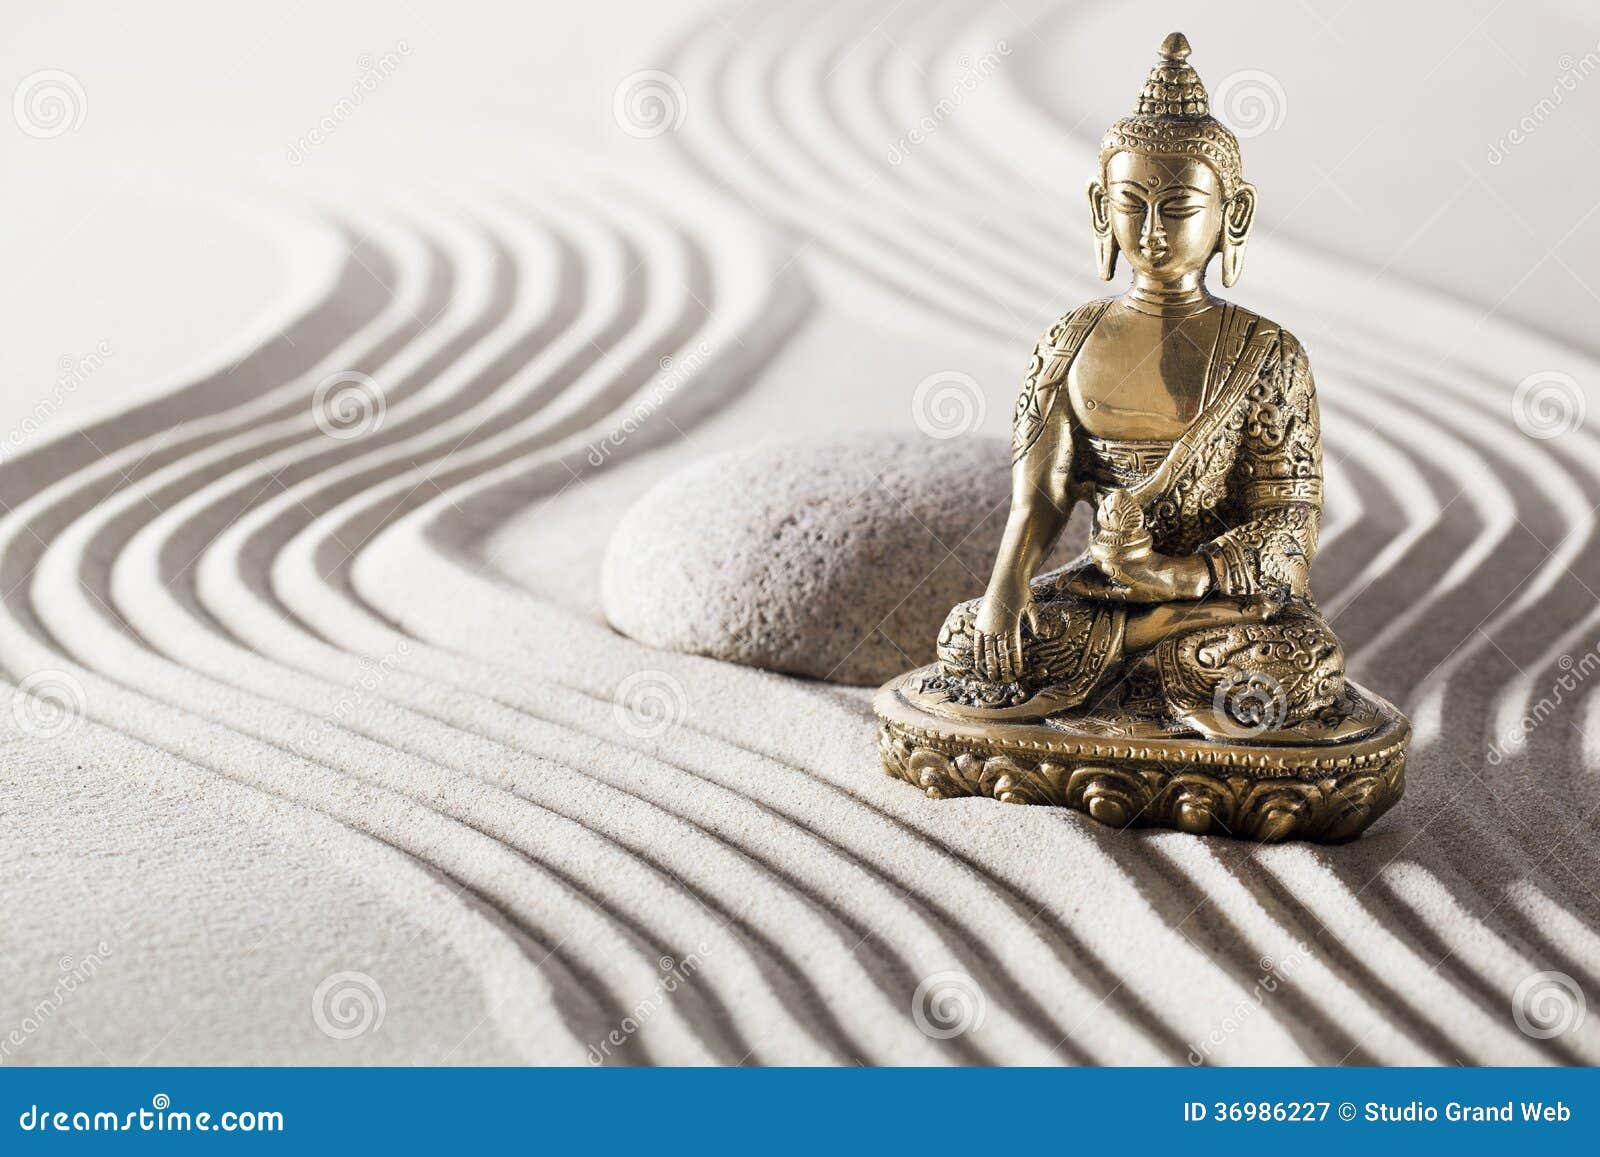 relaxing meditation with buddhism mindset stock image image 36986227. Black Bedroom Furniture Sets. Home Design Ideas